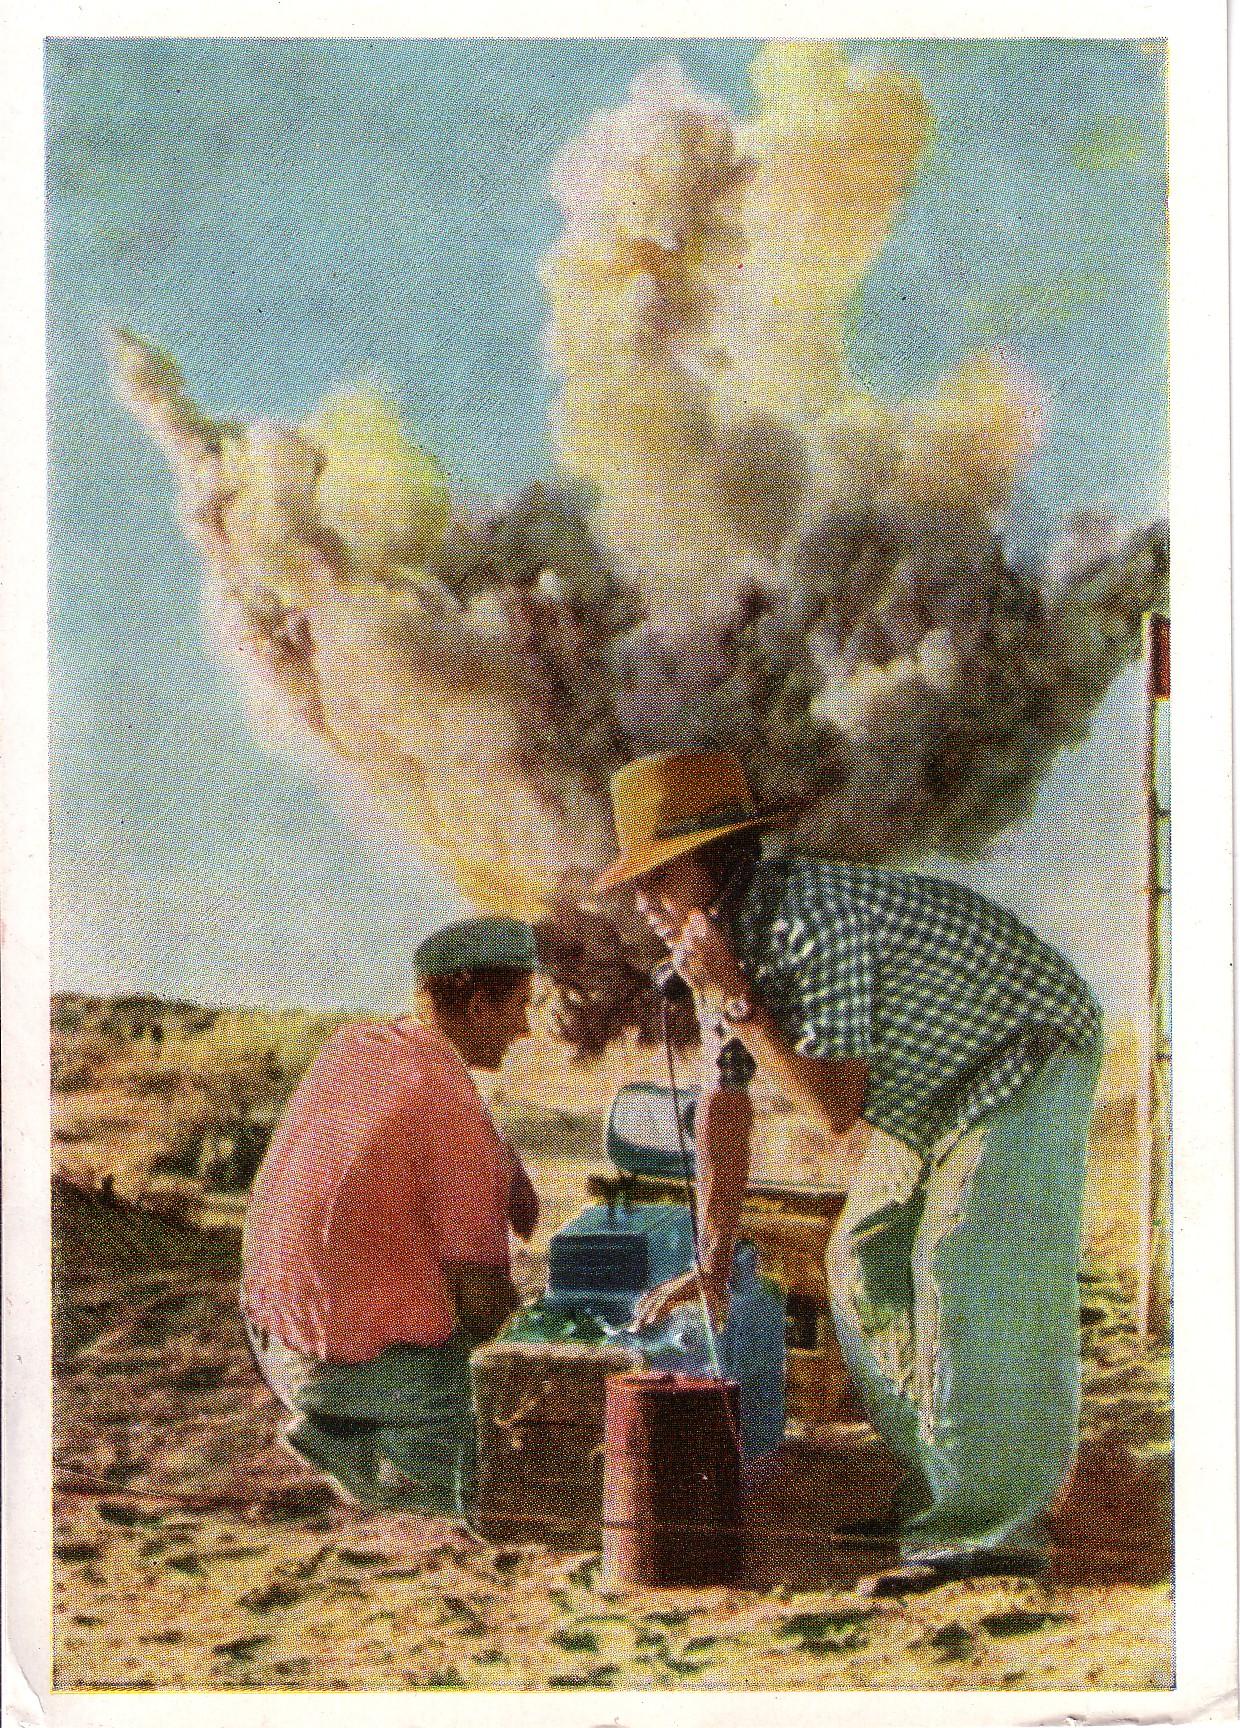 dynamite photo